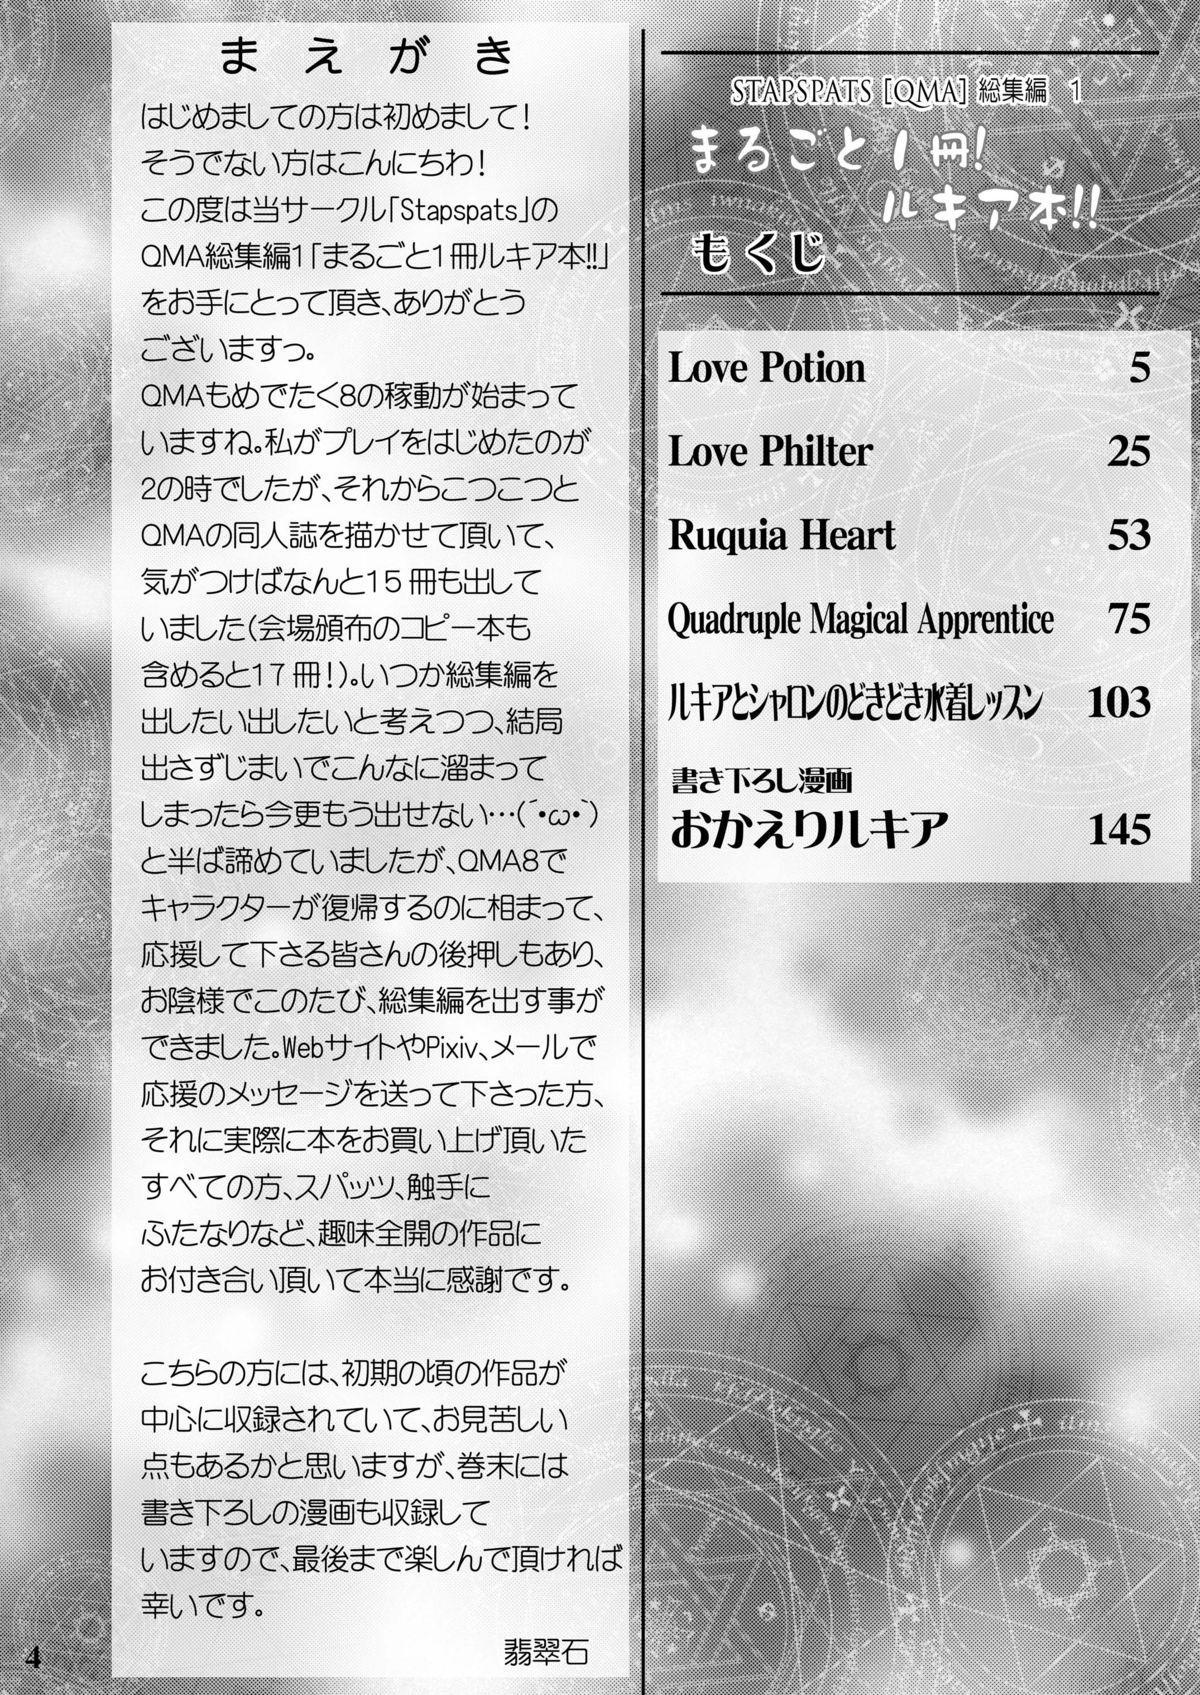 Stapspats QMA Soushuuhen 1: Marugoto Issatsu! Ruquia Hon!! 3